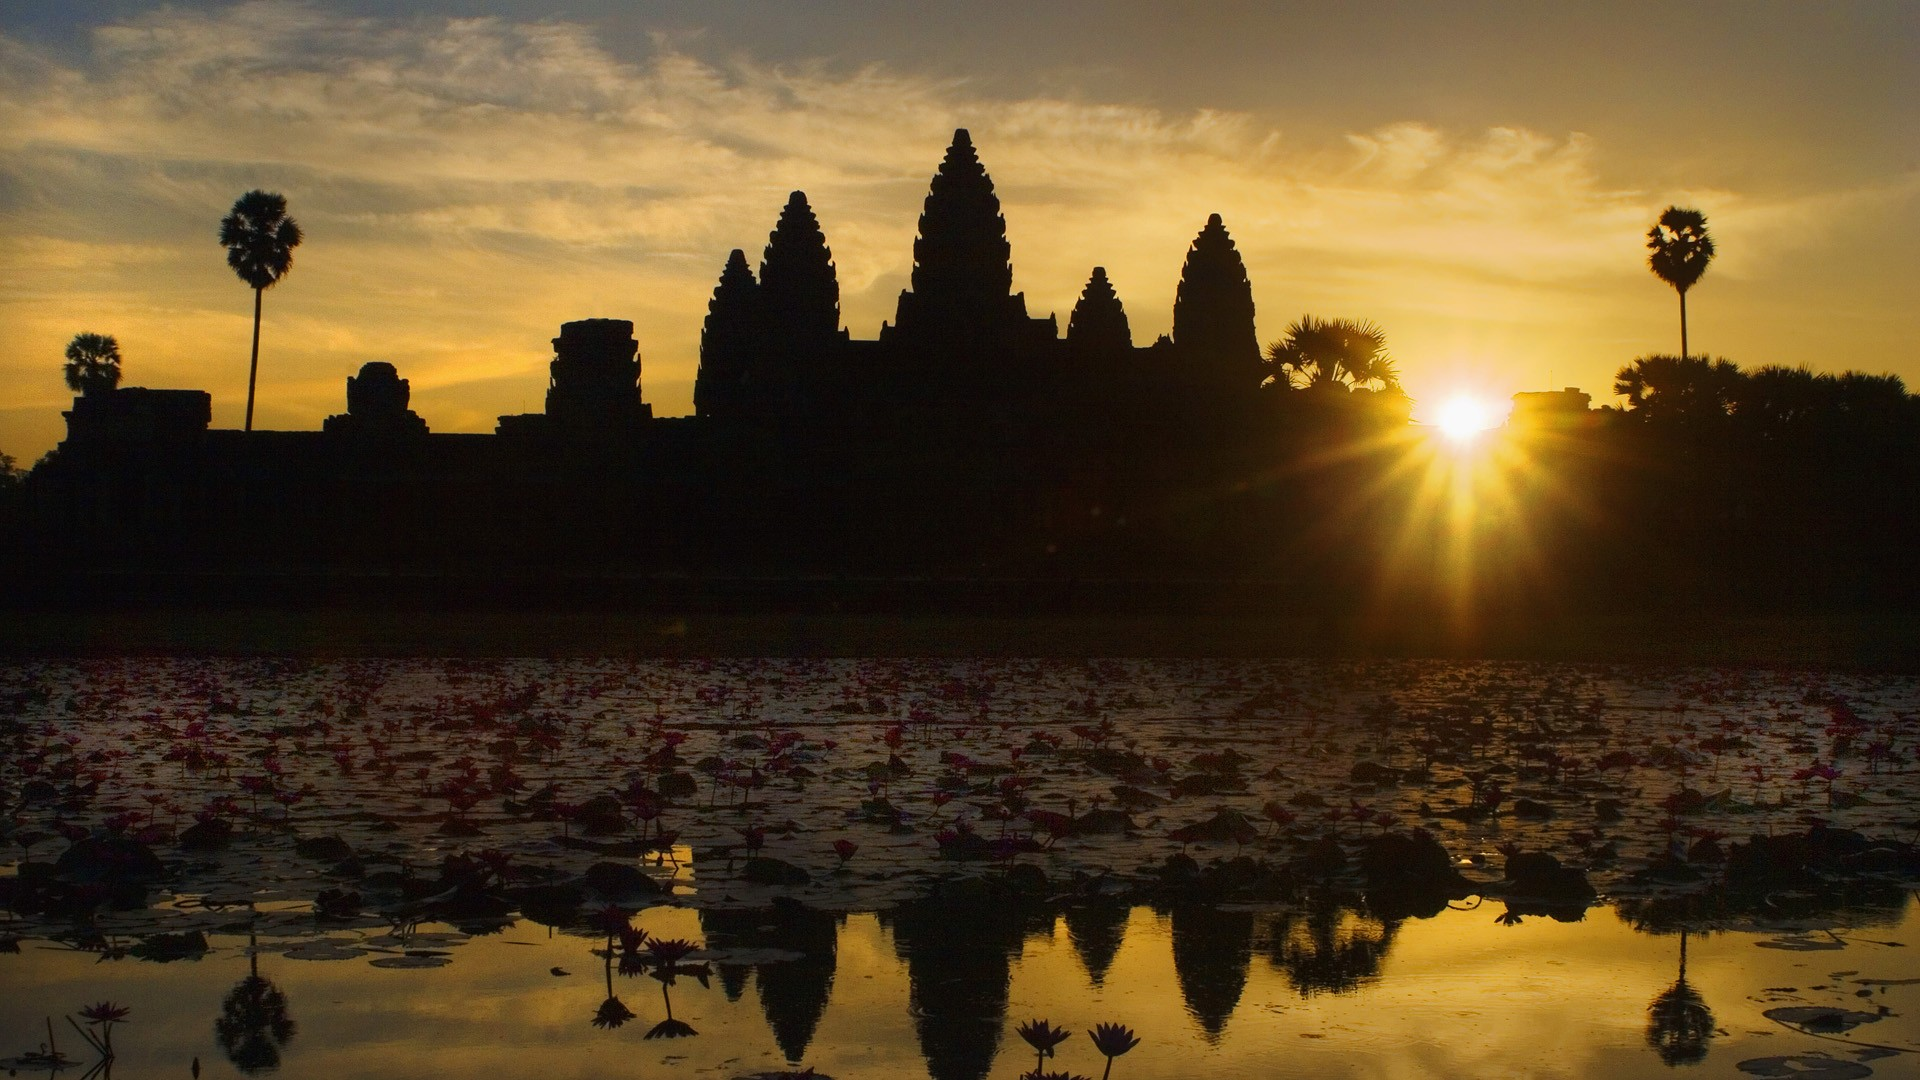 37] Cambodia Wallpaper HD on WallpaperSafari 1920x1080